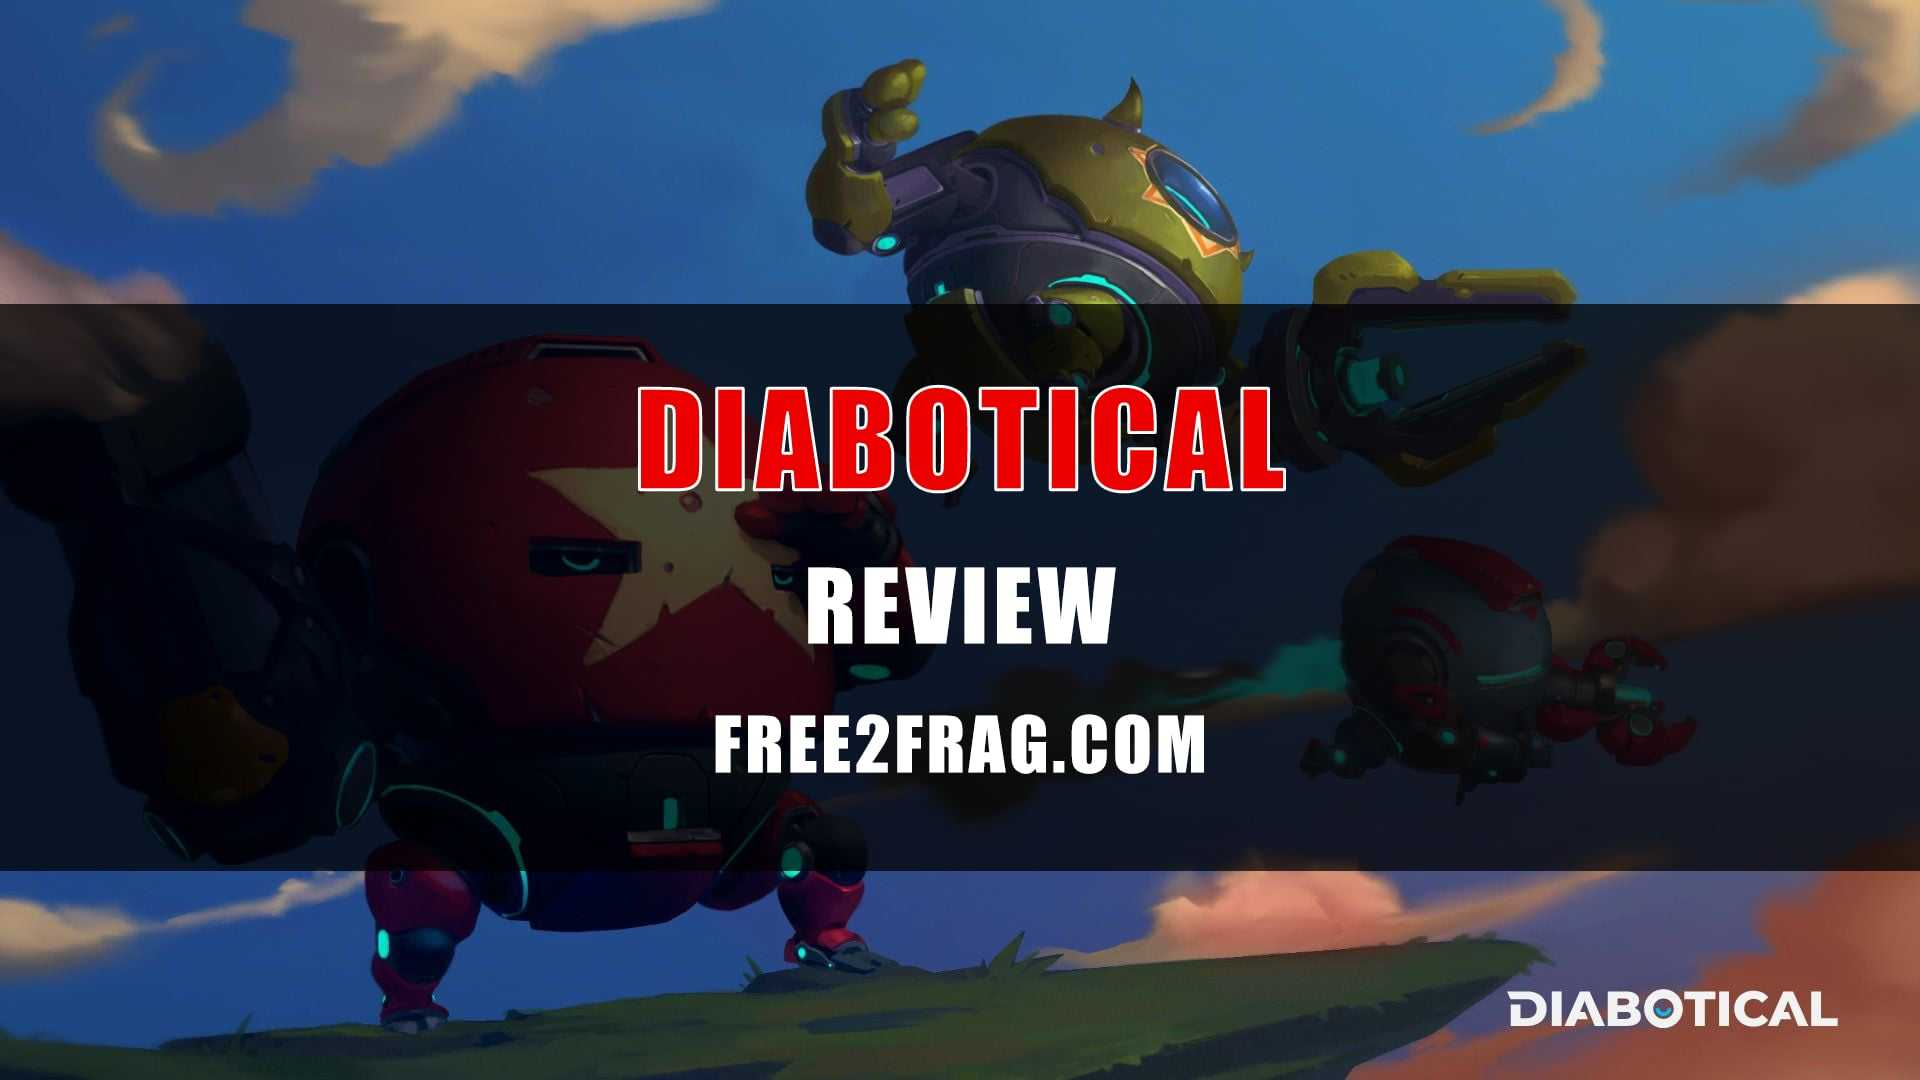 Diabotical Review